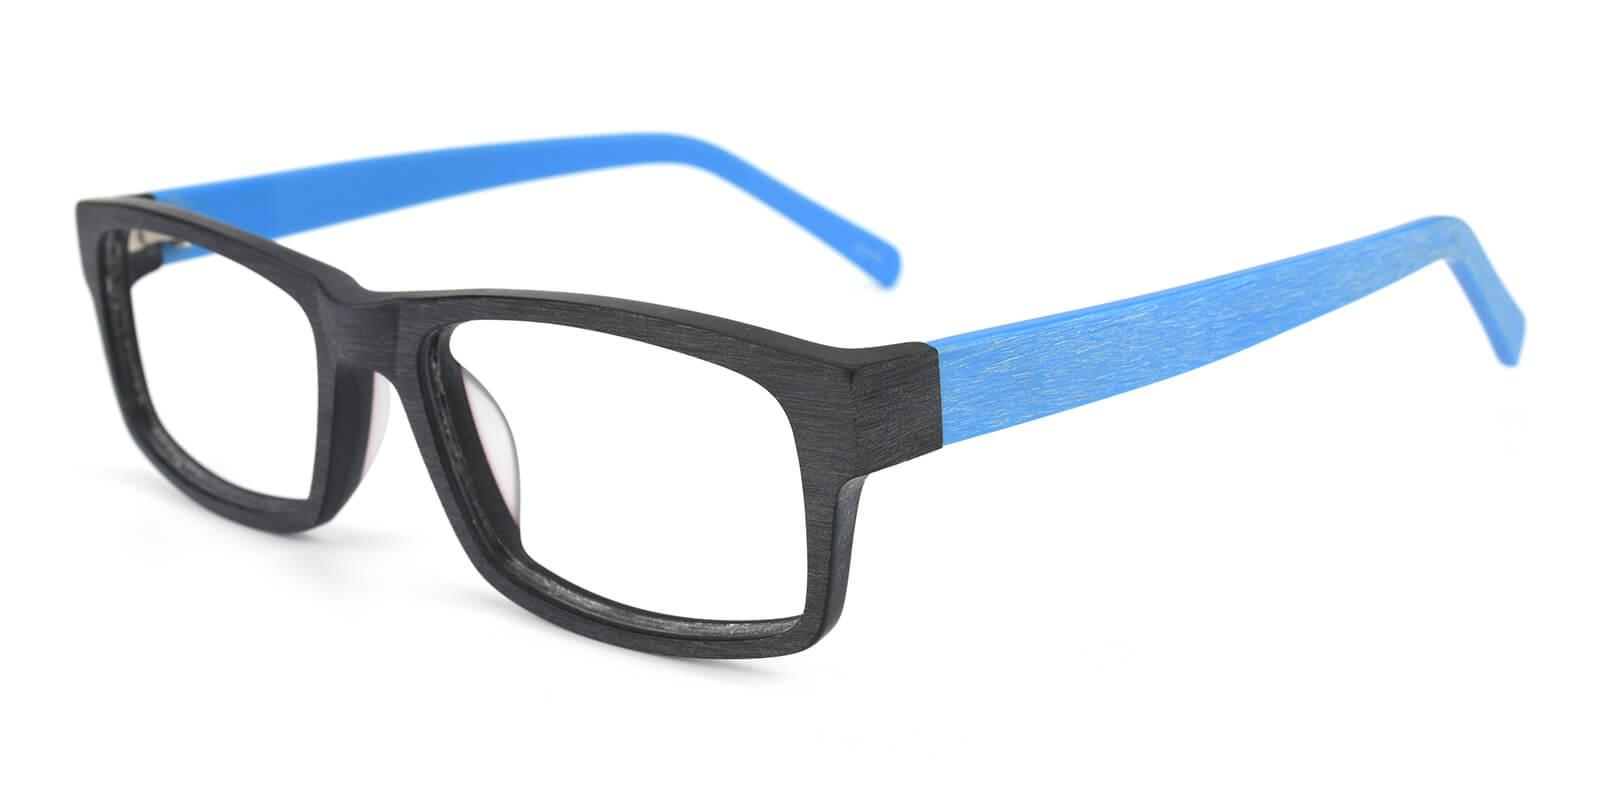 Nadien-Blue-Rectangle-Acetate-Eyeglasses-additional1